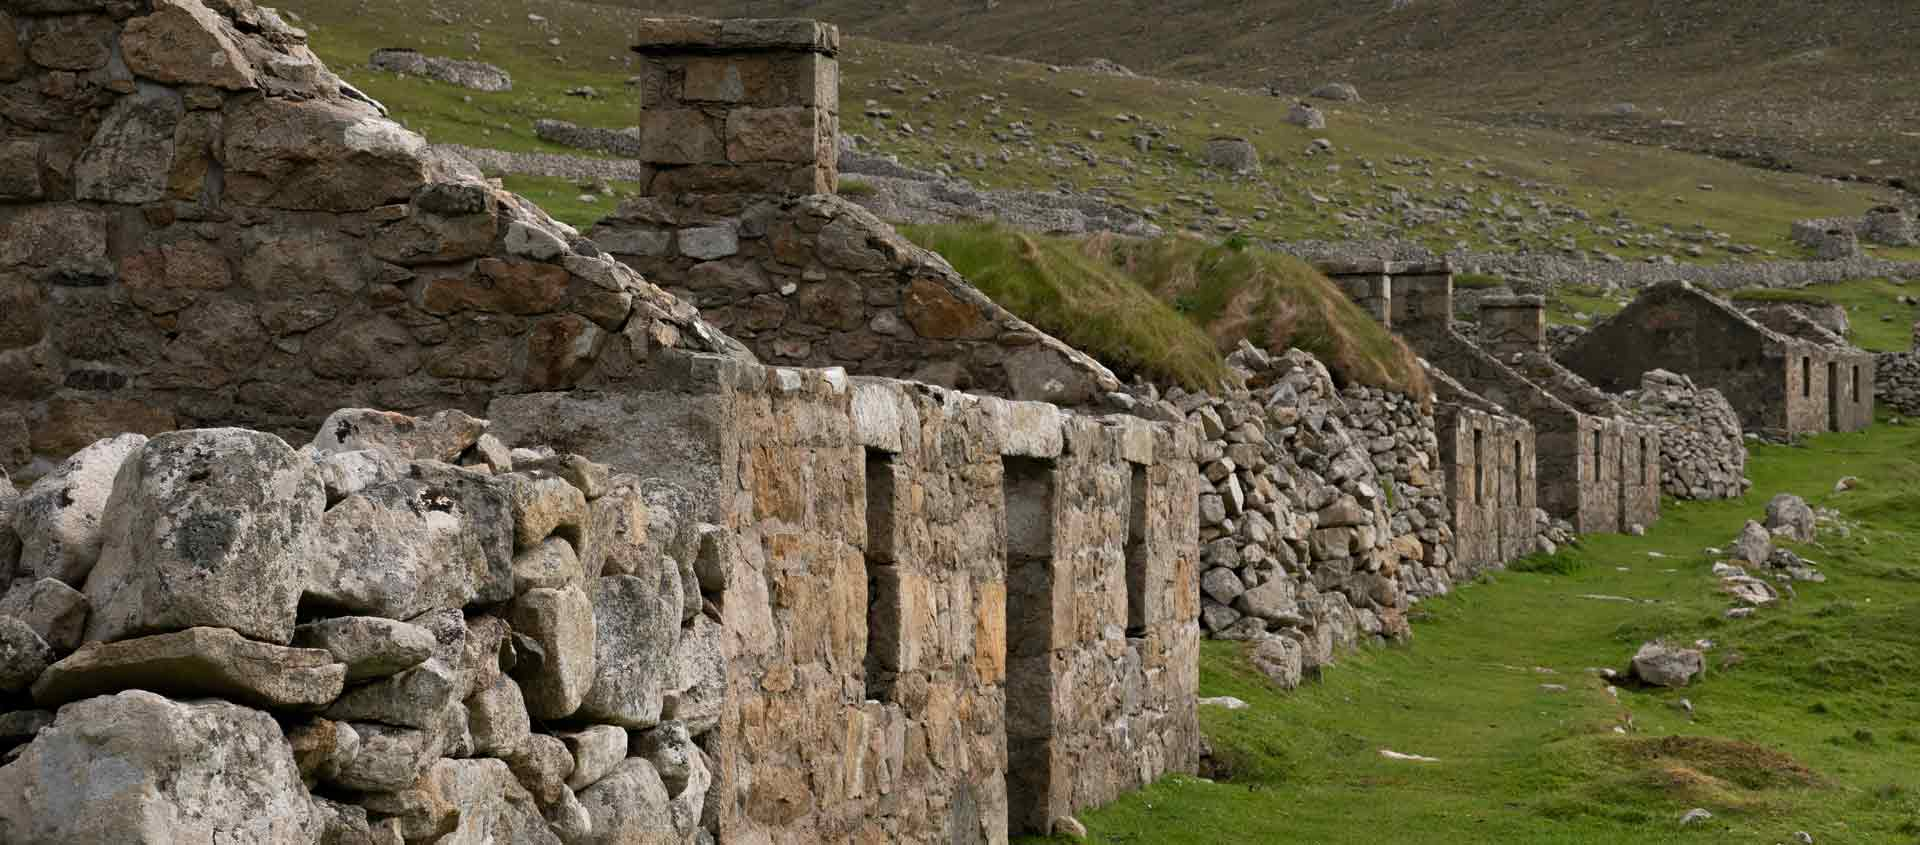 Cruise the British Isles and Norway photo showing ruins at St. Kilda